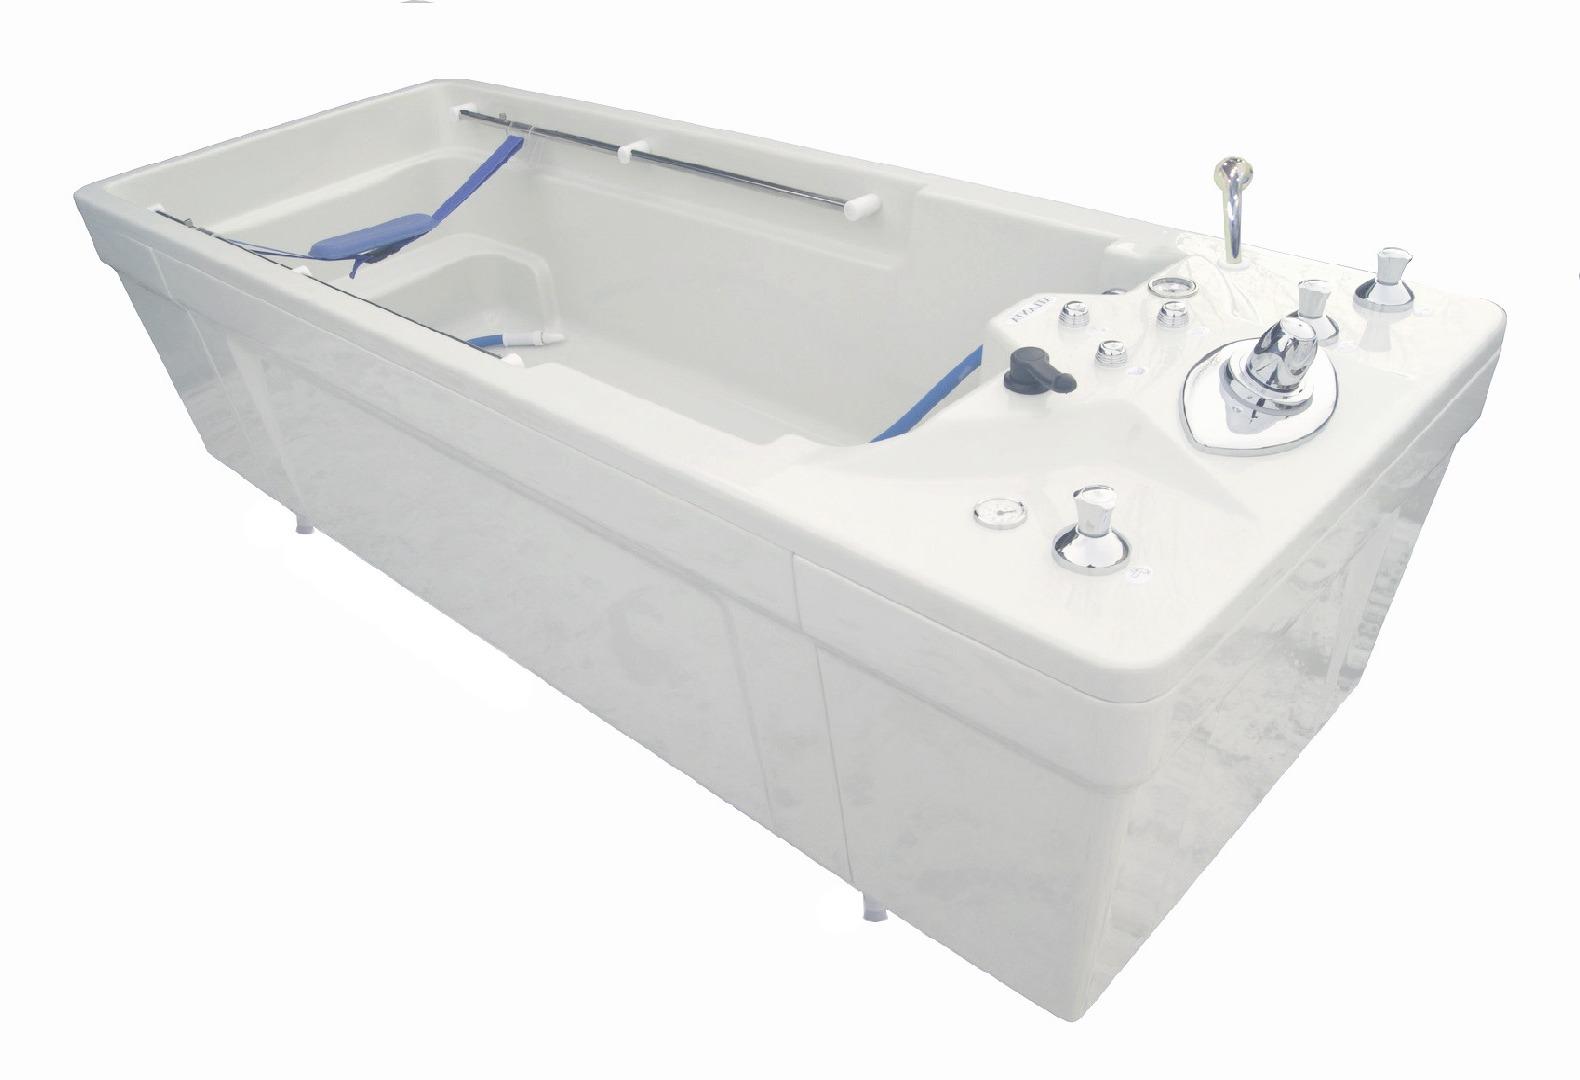 Ванна ATLANTA для подводного душа-массажа